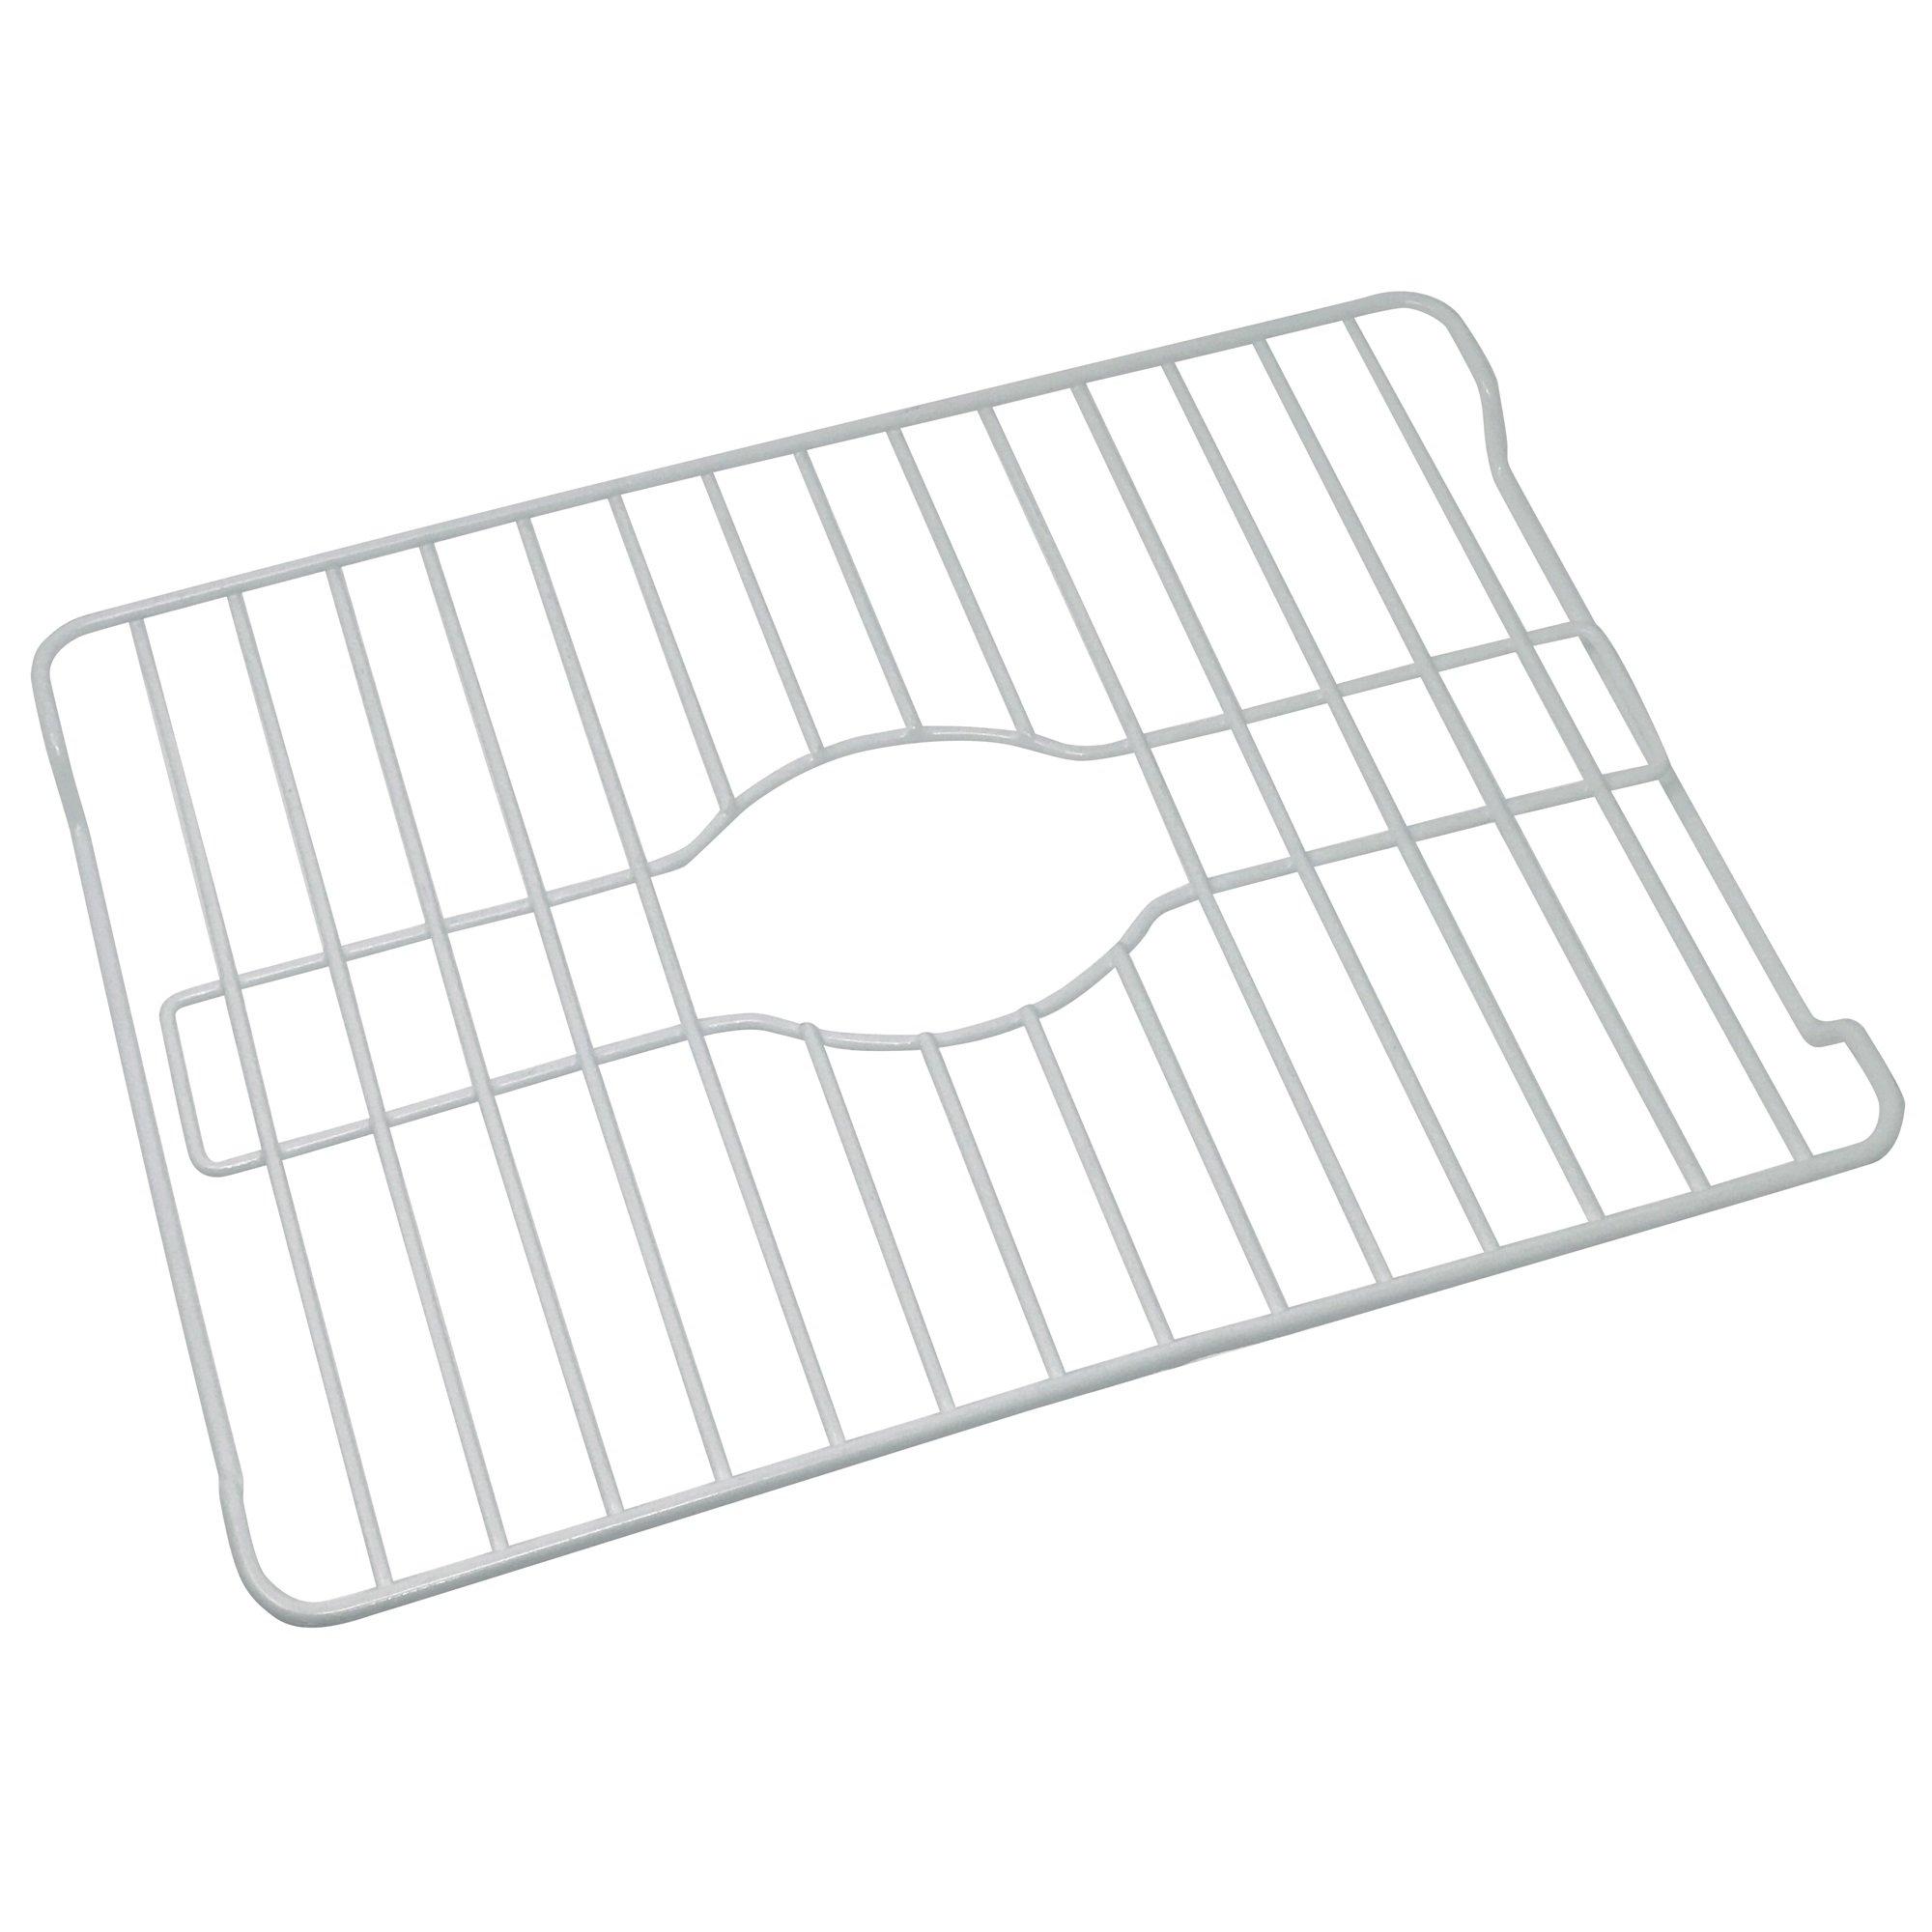 Better Houseware 1486/W Medium Sink Protector, White